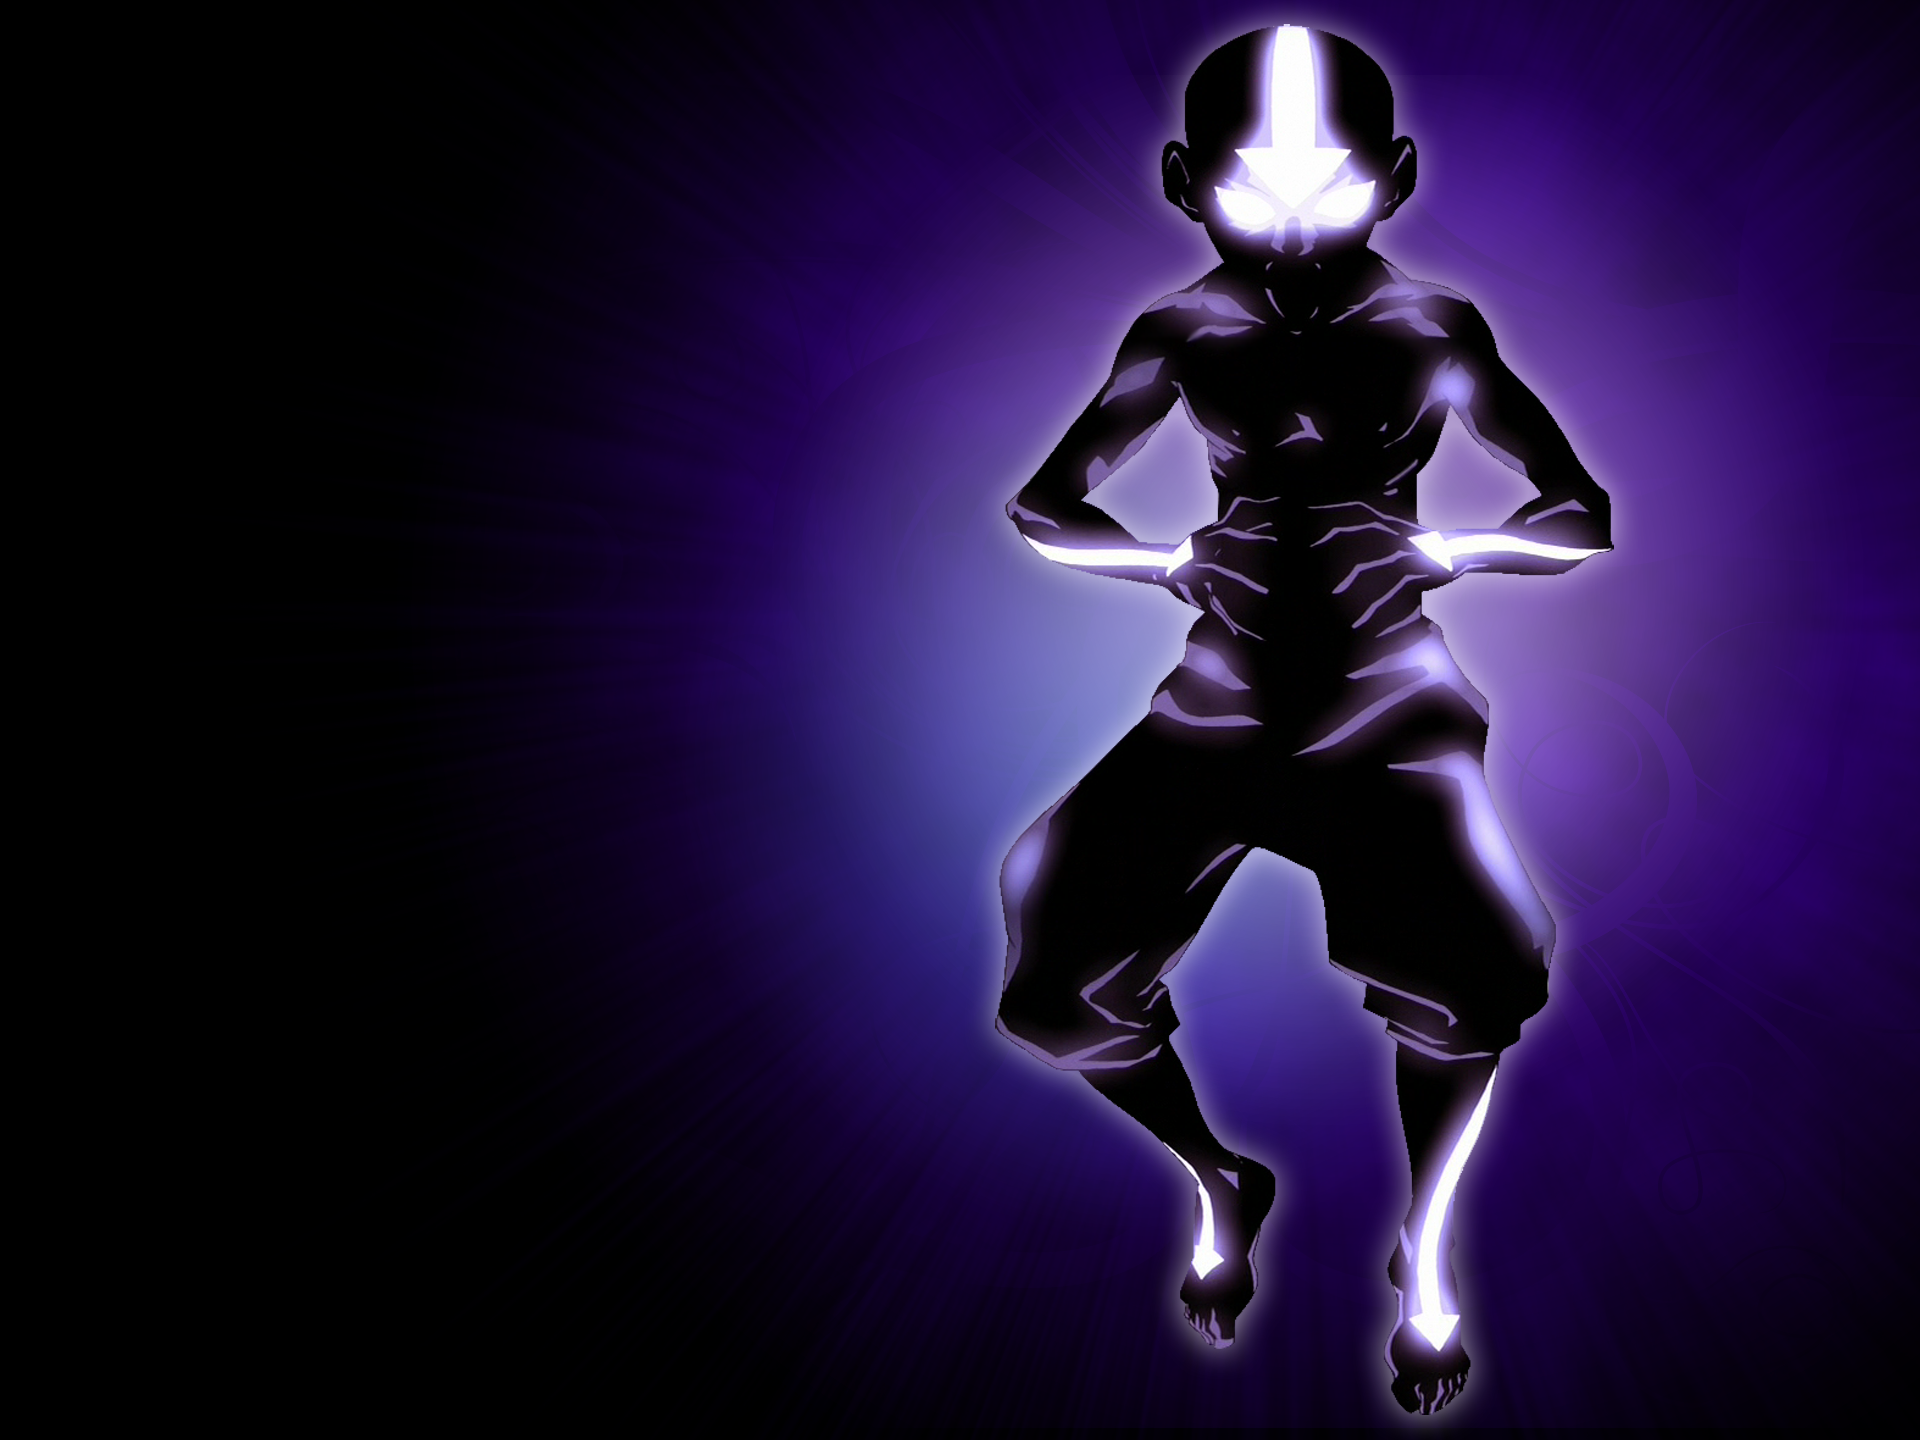 Avatar Aang Wallpaper 8 Anime Background Animewp